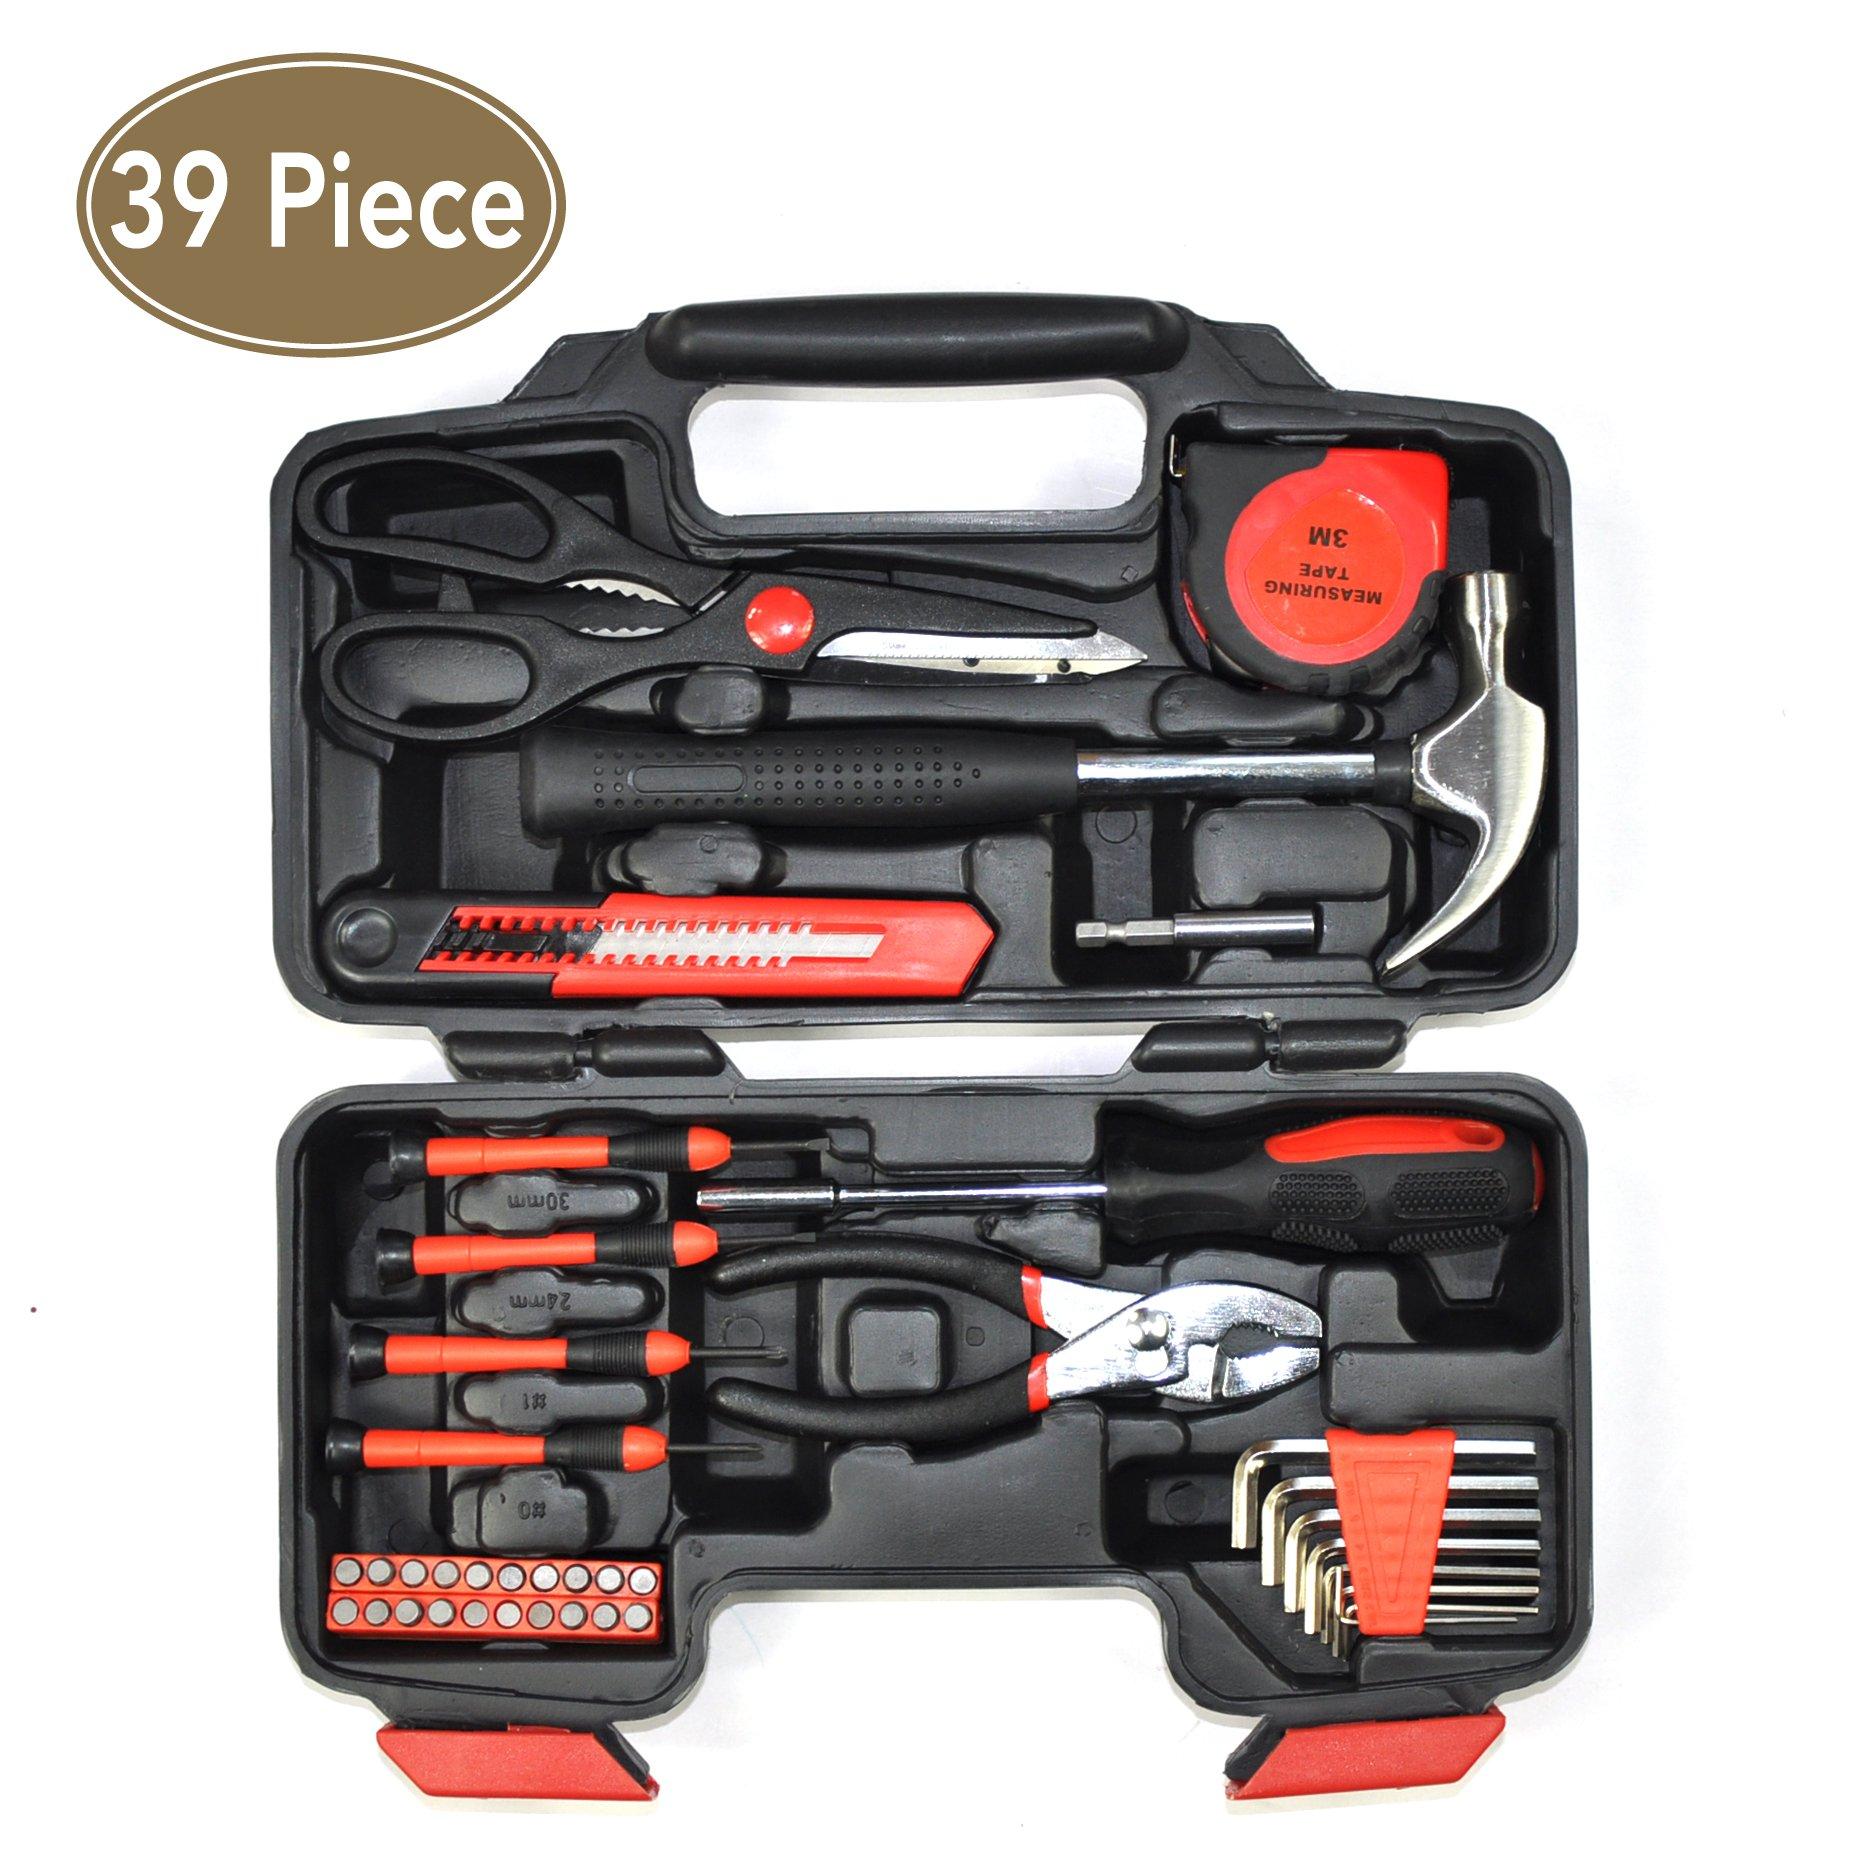 39 Piece home repair tools tool set Multi-Tool Kit general repair hand tool set with tool box storage case 80001M